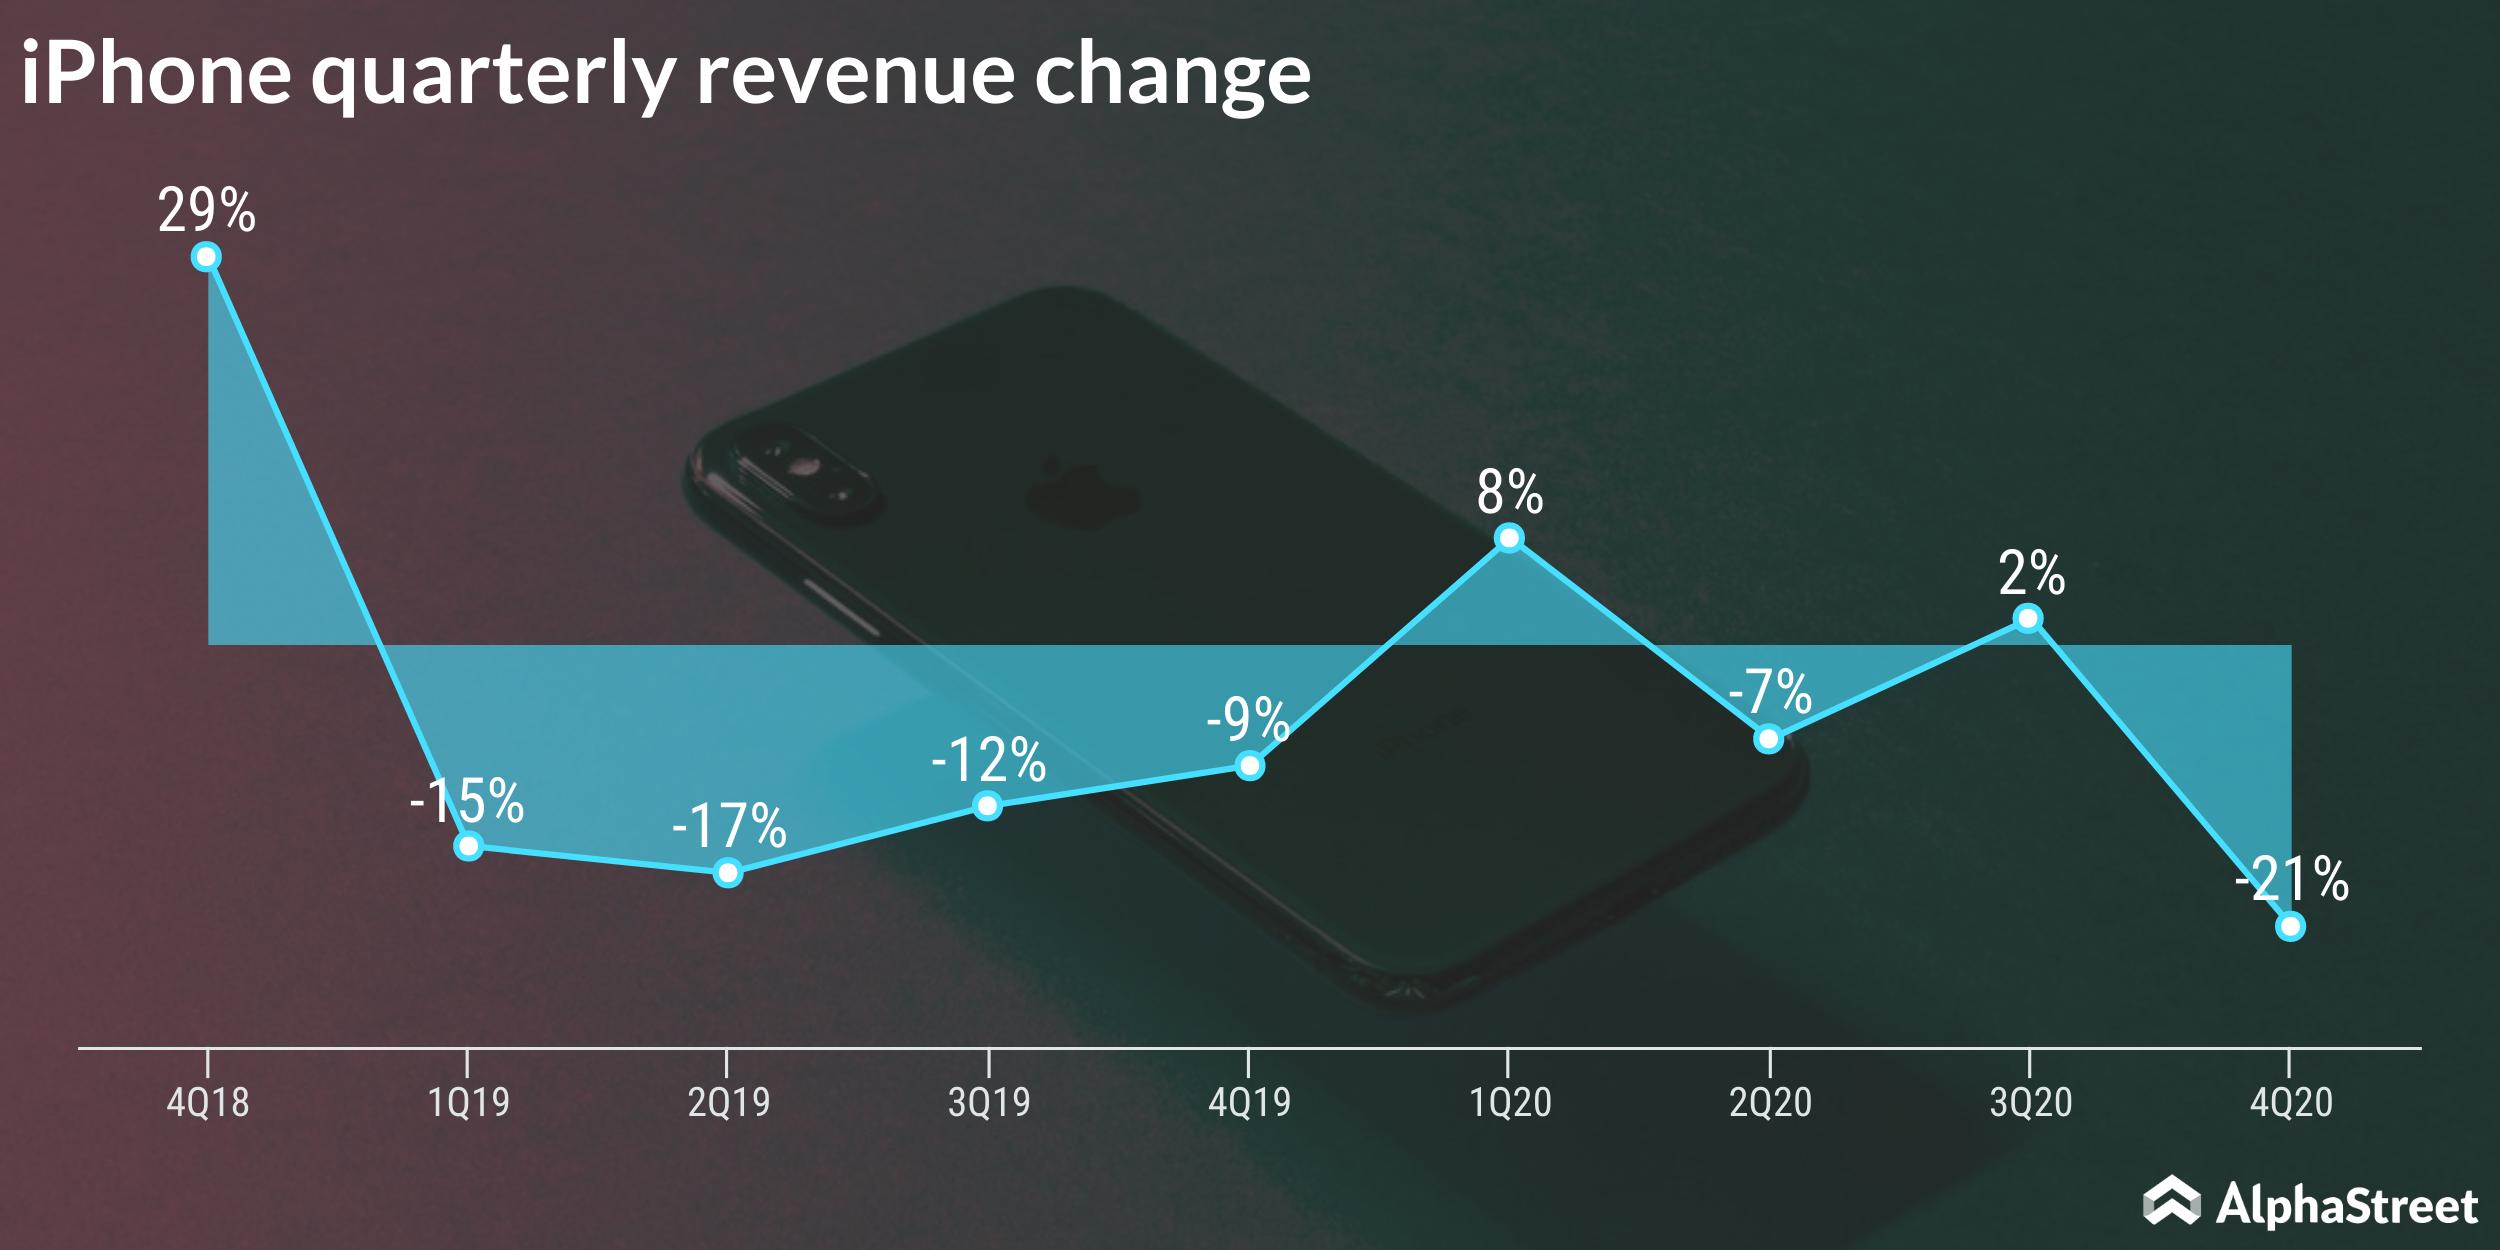 iPhone quarterly revenue change